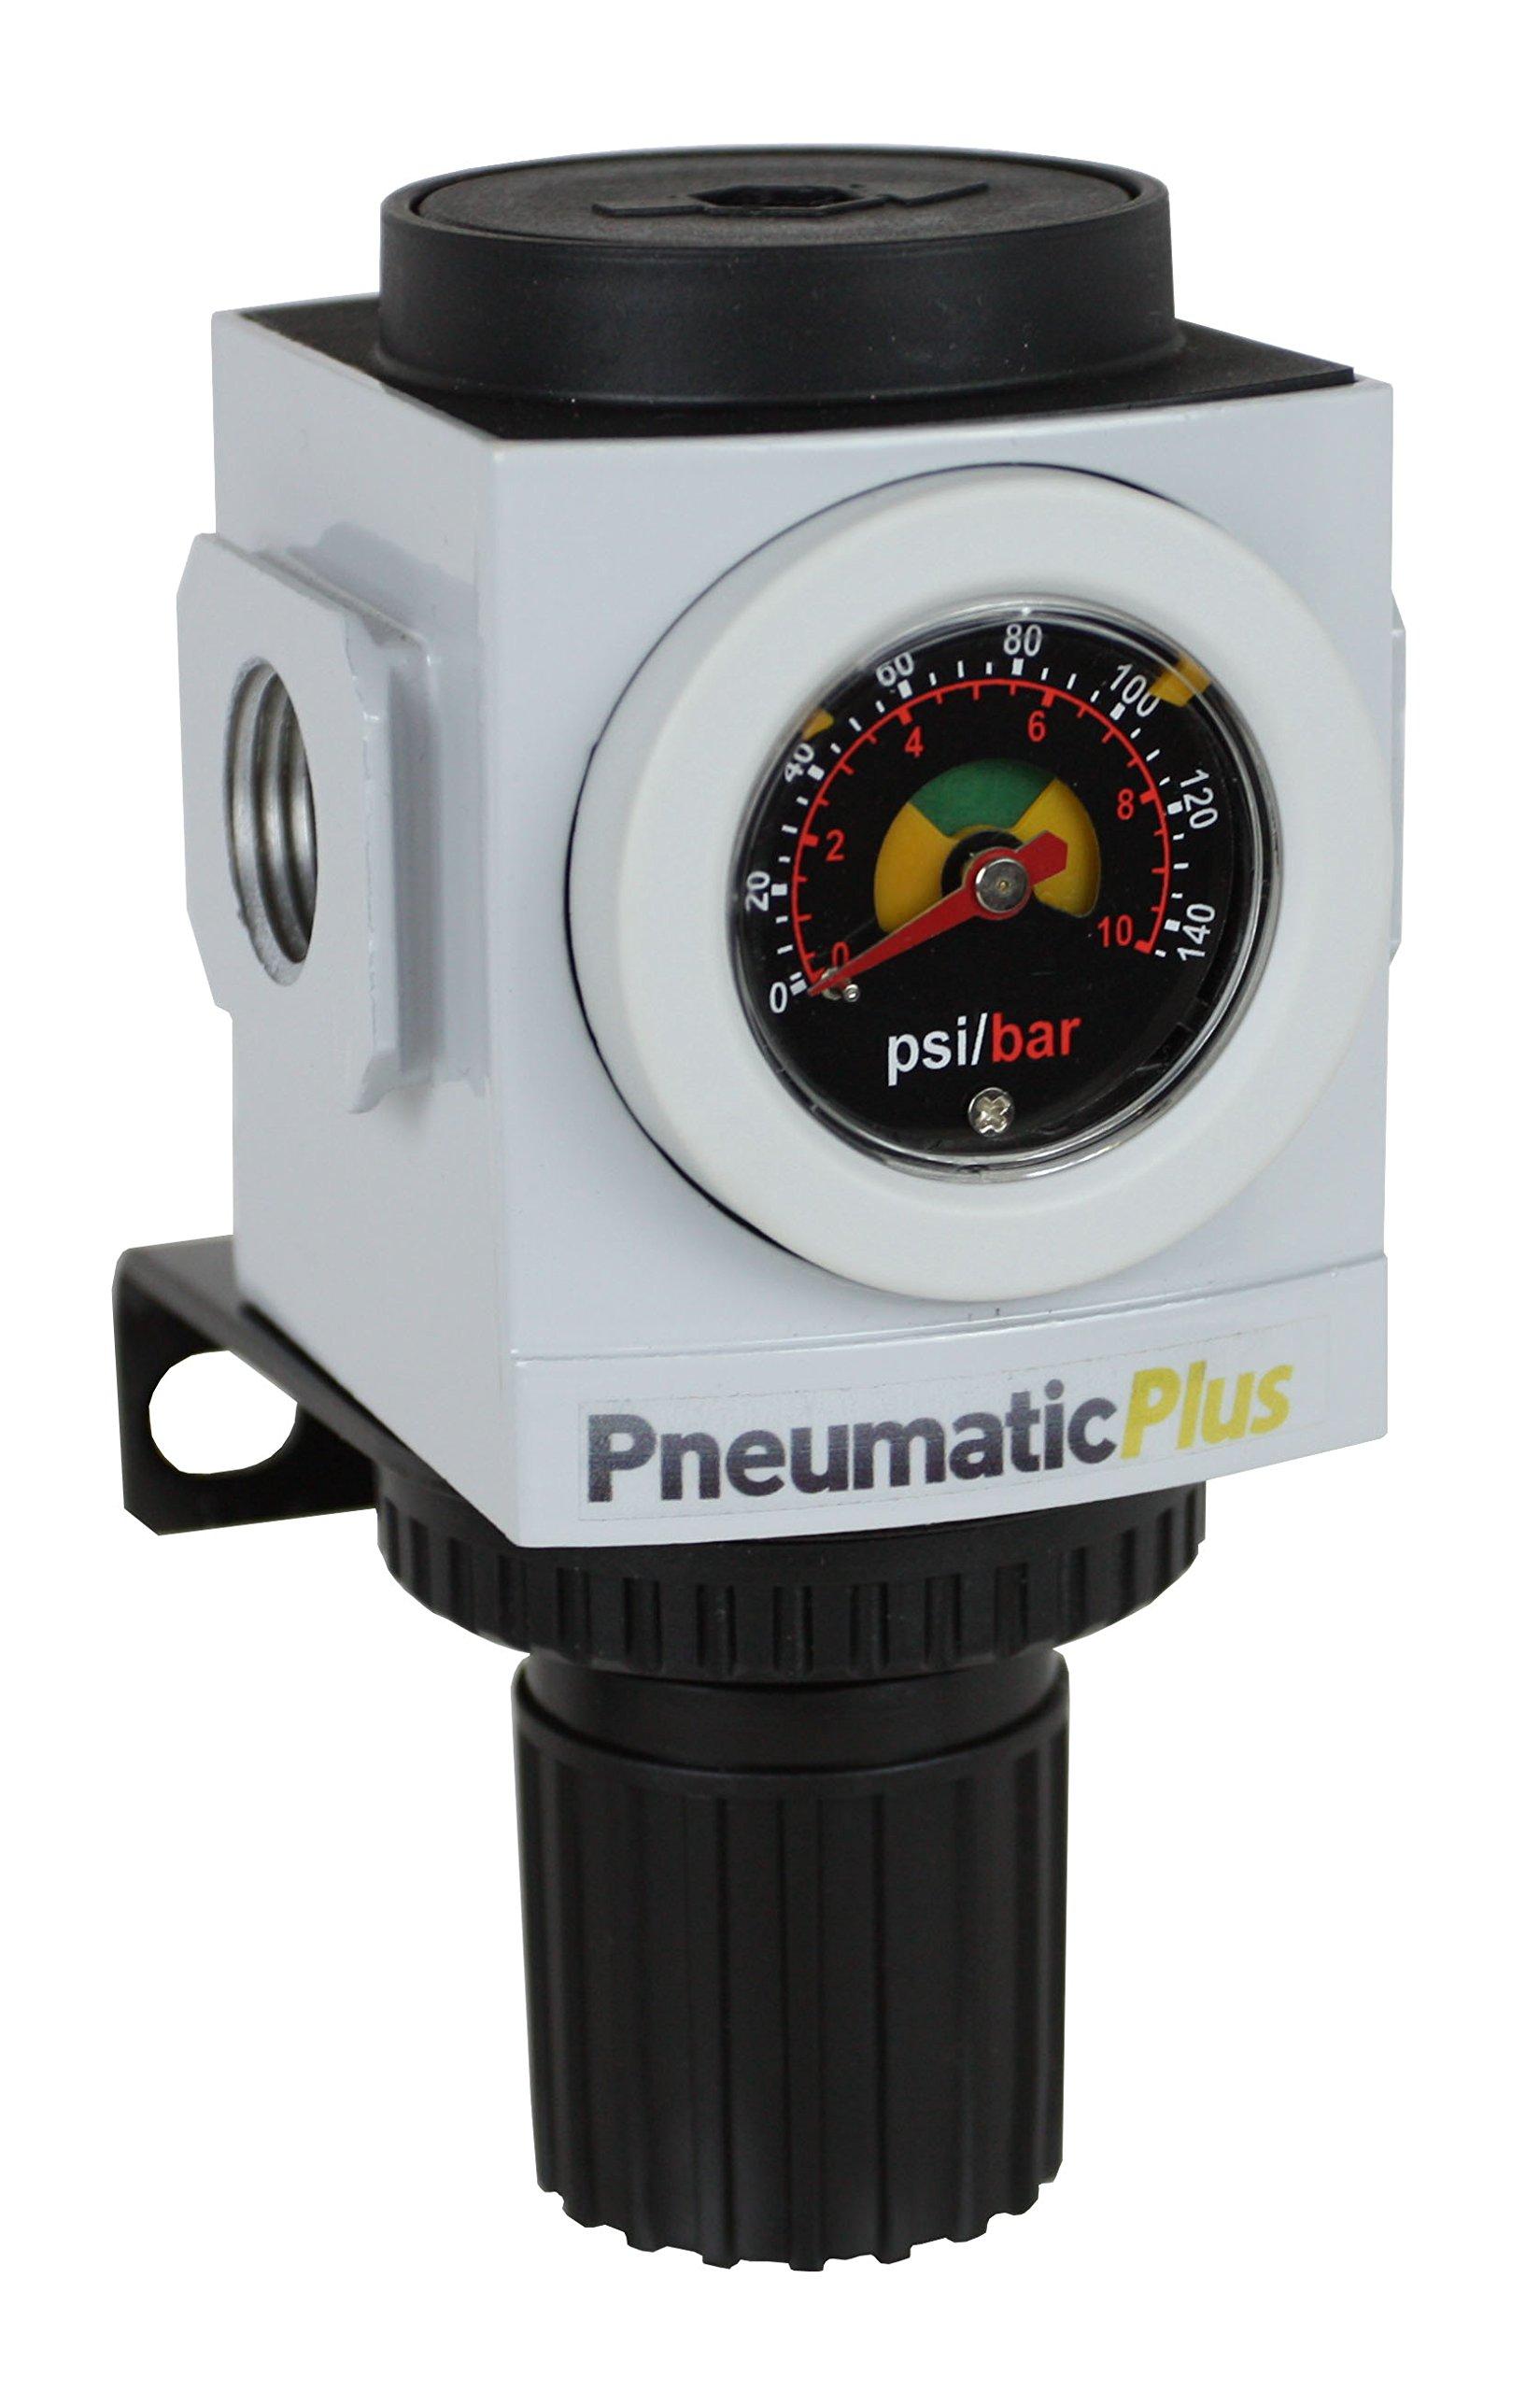 PneumaticPlus PPR3-N02BG Compressed Air Pressure Regulator, 1/4'' NPT (High Flow), Embedded Gauge and Bracket by PneumaticPlus